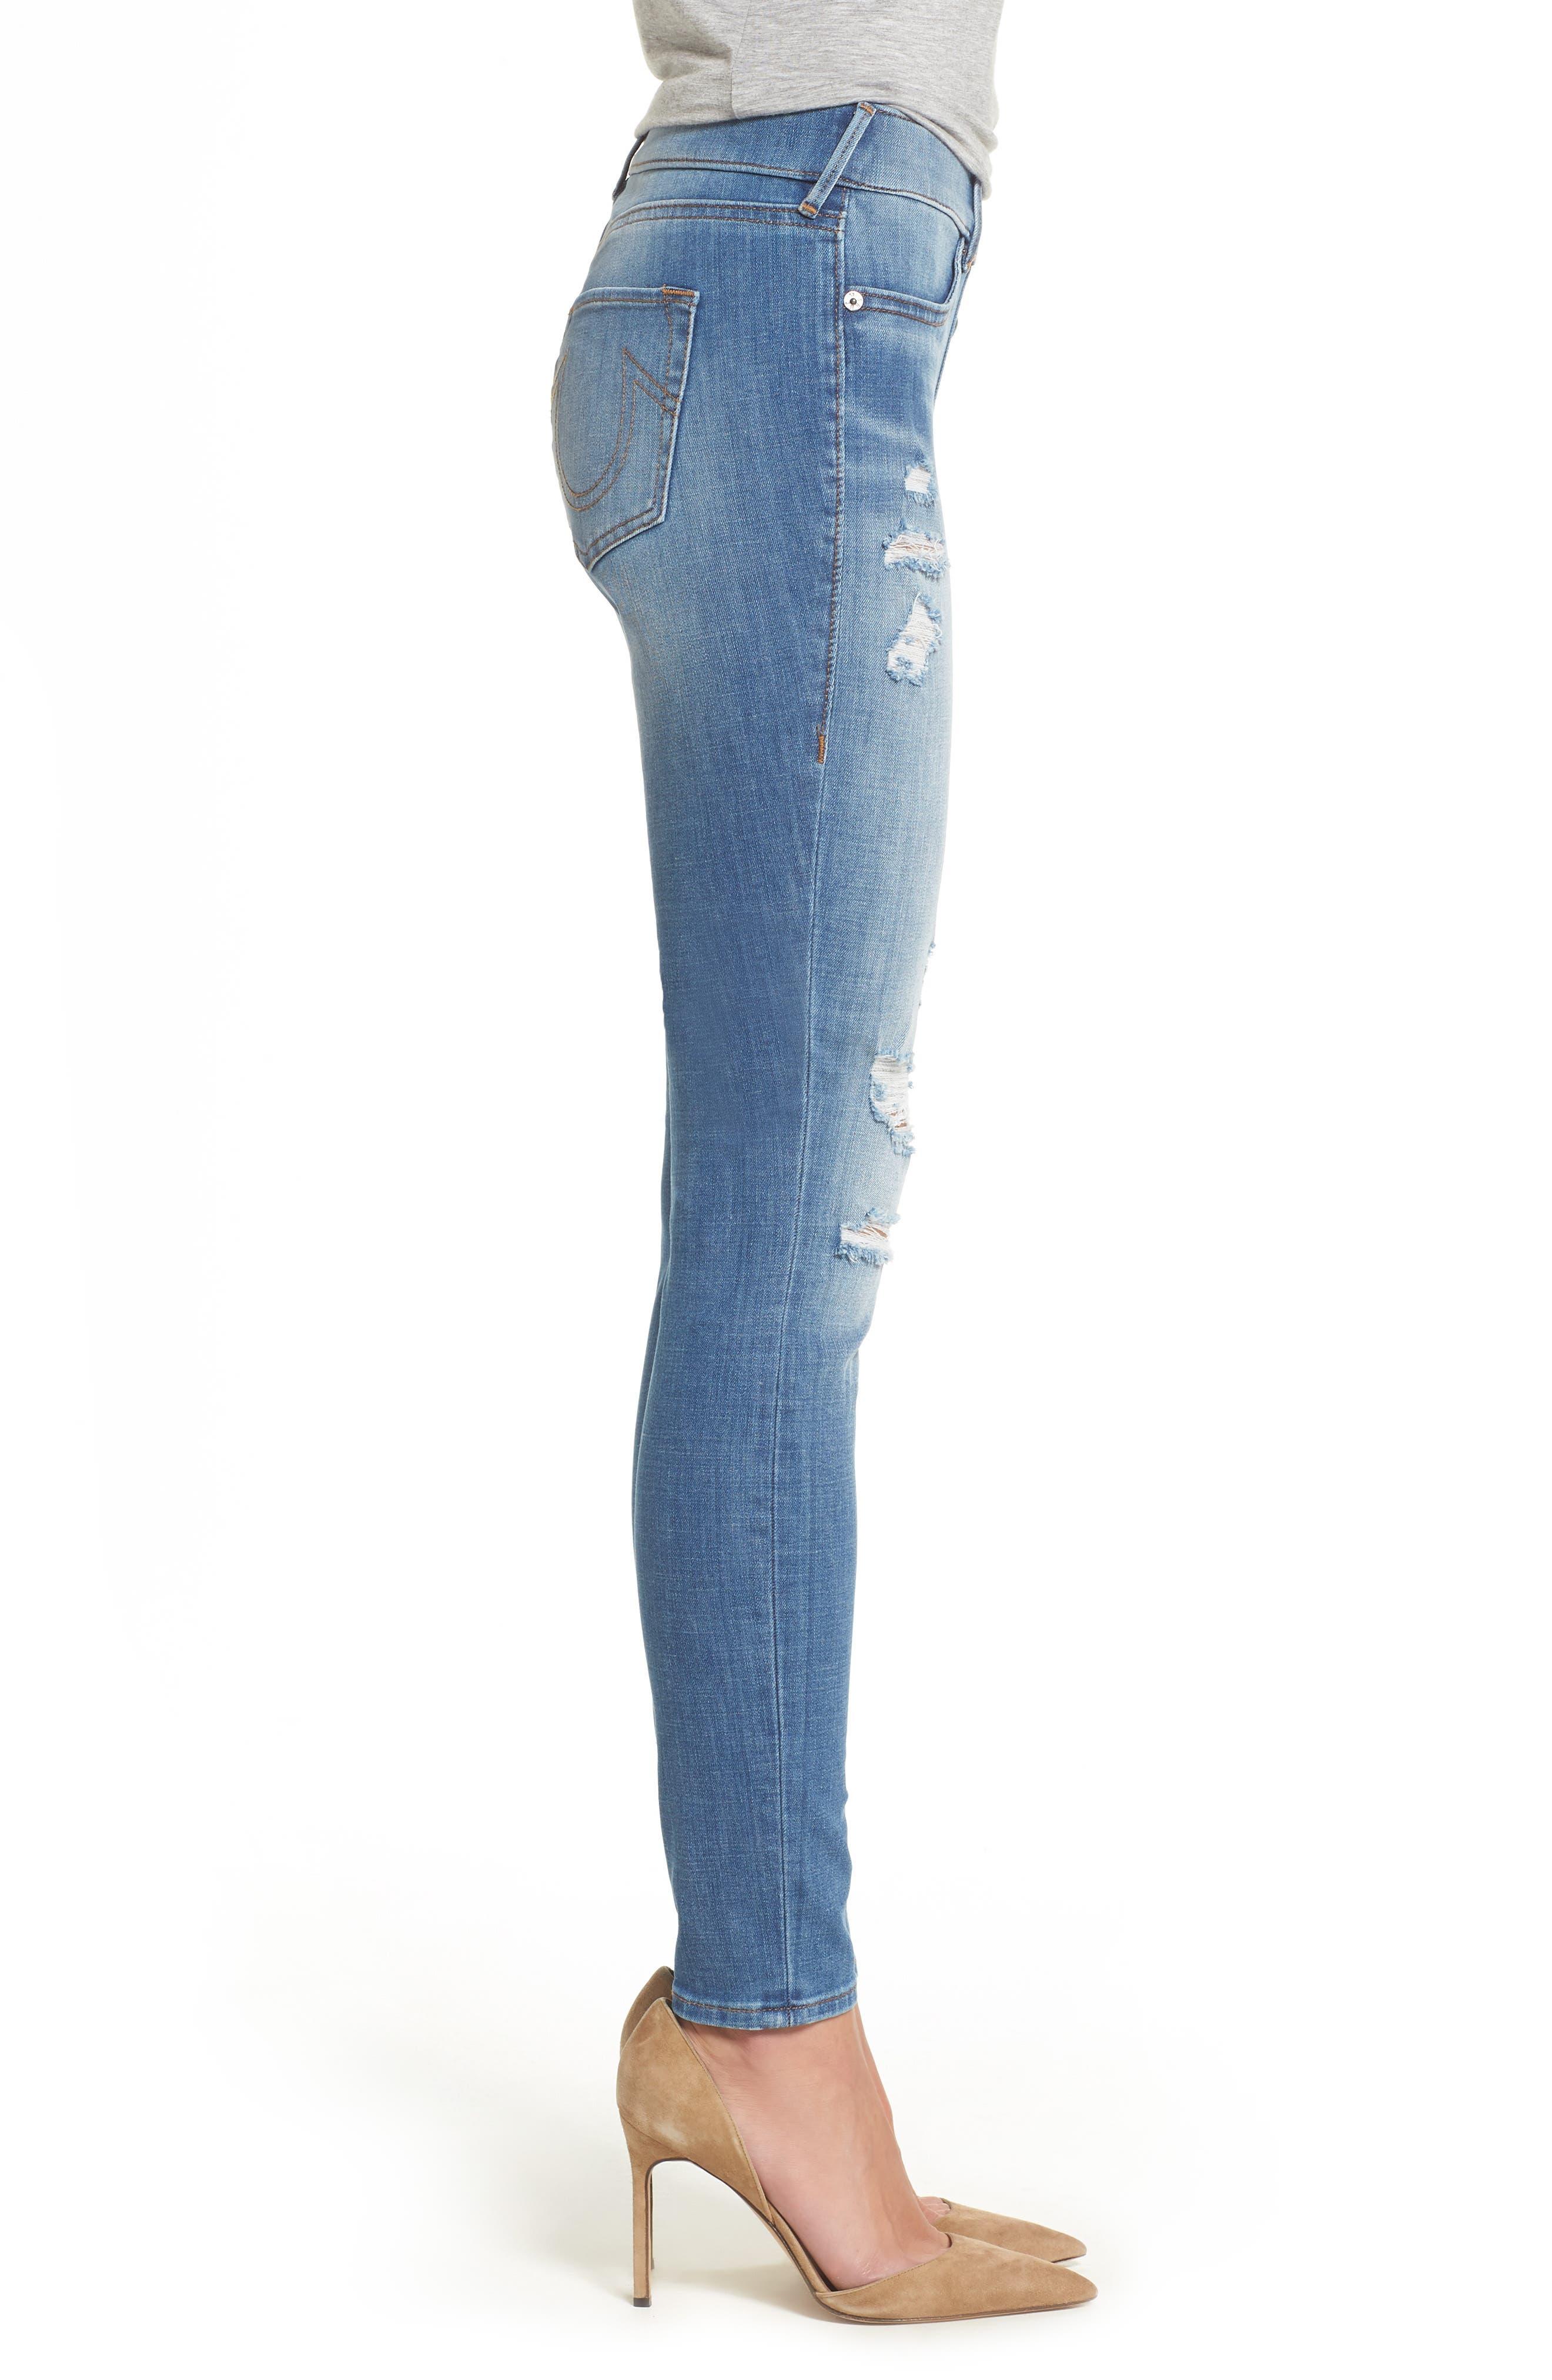 Jennie Runway Curvy Skinny Jeans,                             Alternate thumbnail 3, color,                             400